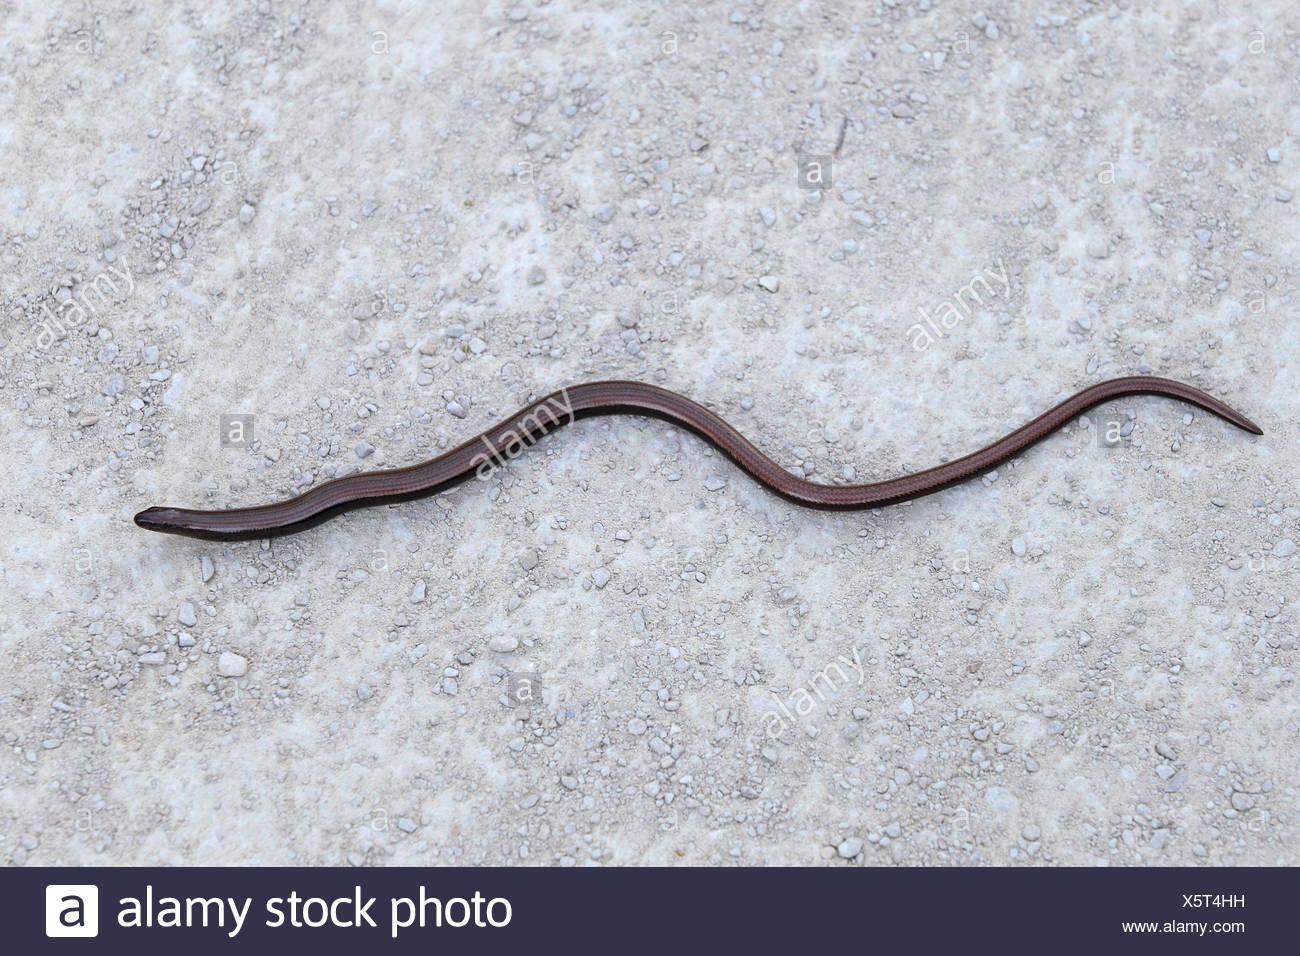 European slow worm, blindworm, slow worm (Anguis fragilis), creeping on the ground, France, Camargue Stock Photo